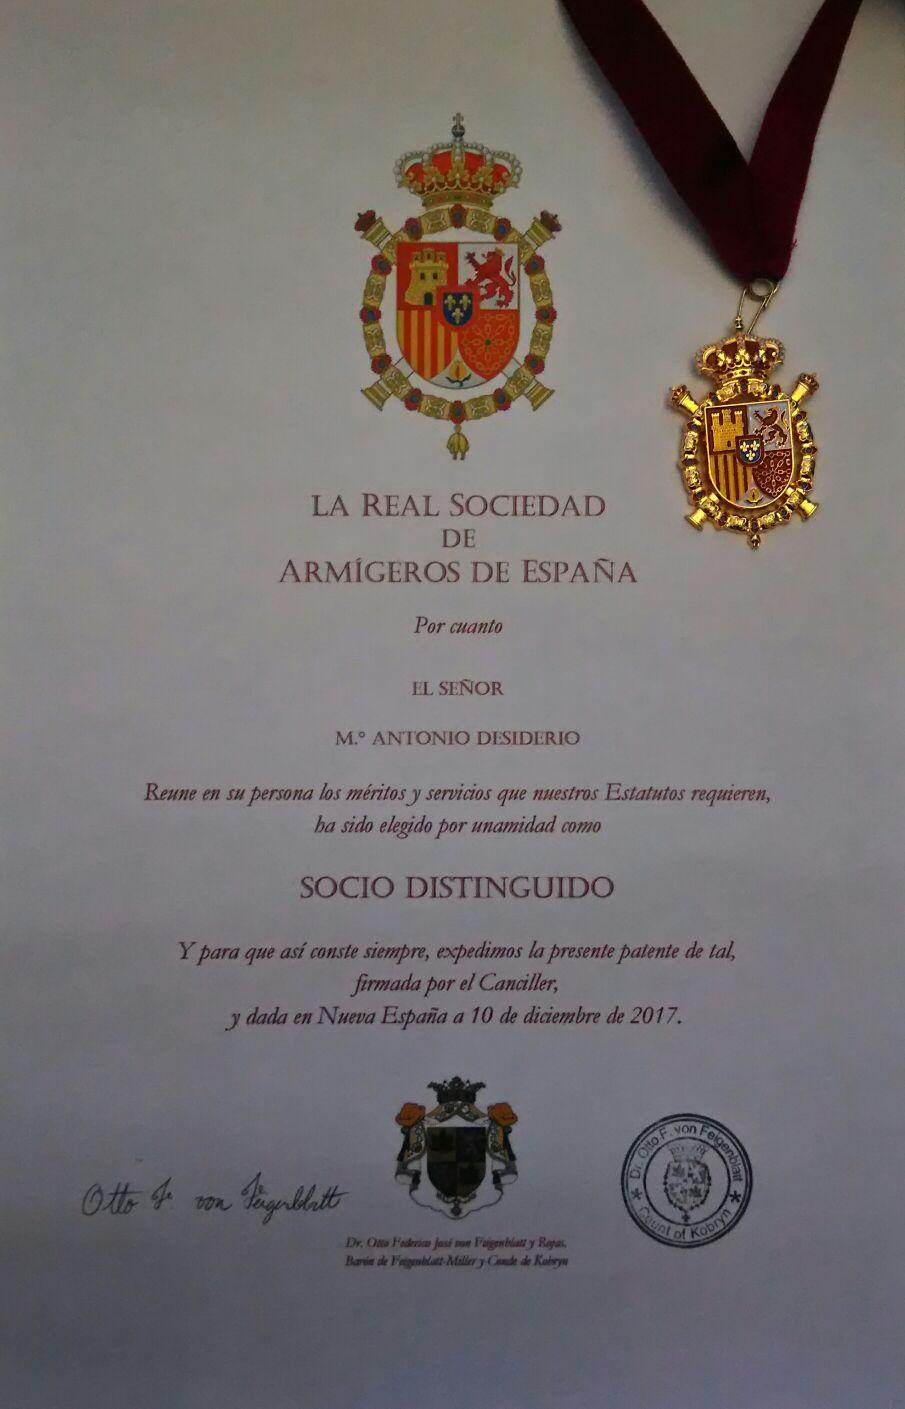 ANTONIO DESIDERIO DIVENTA SOCIO DISTINGUIDO IN SPAGNA